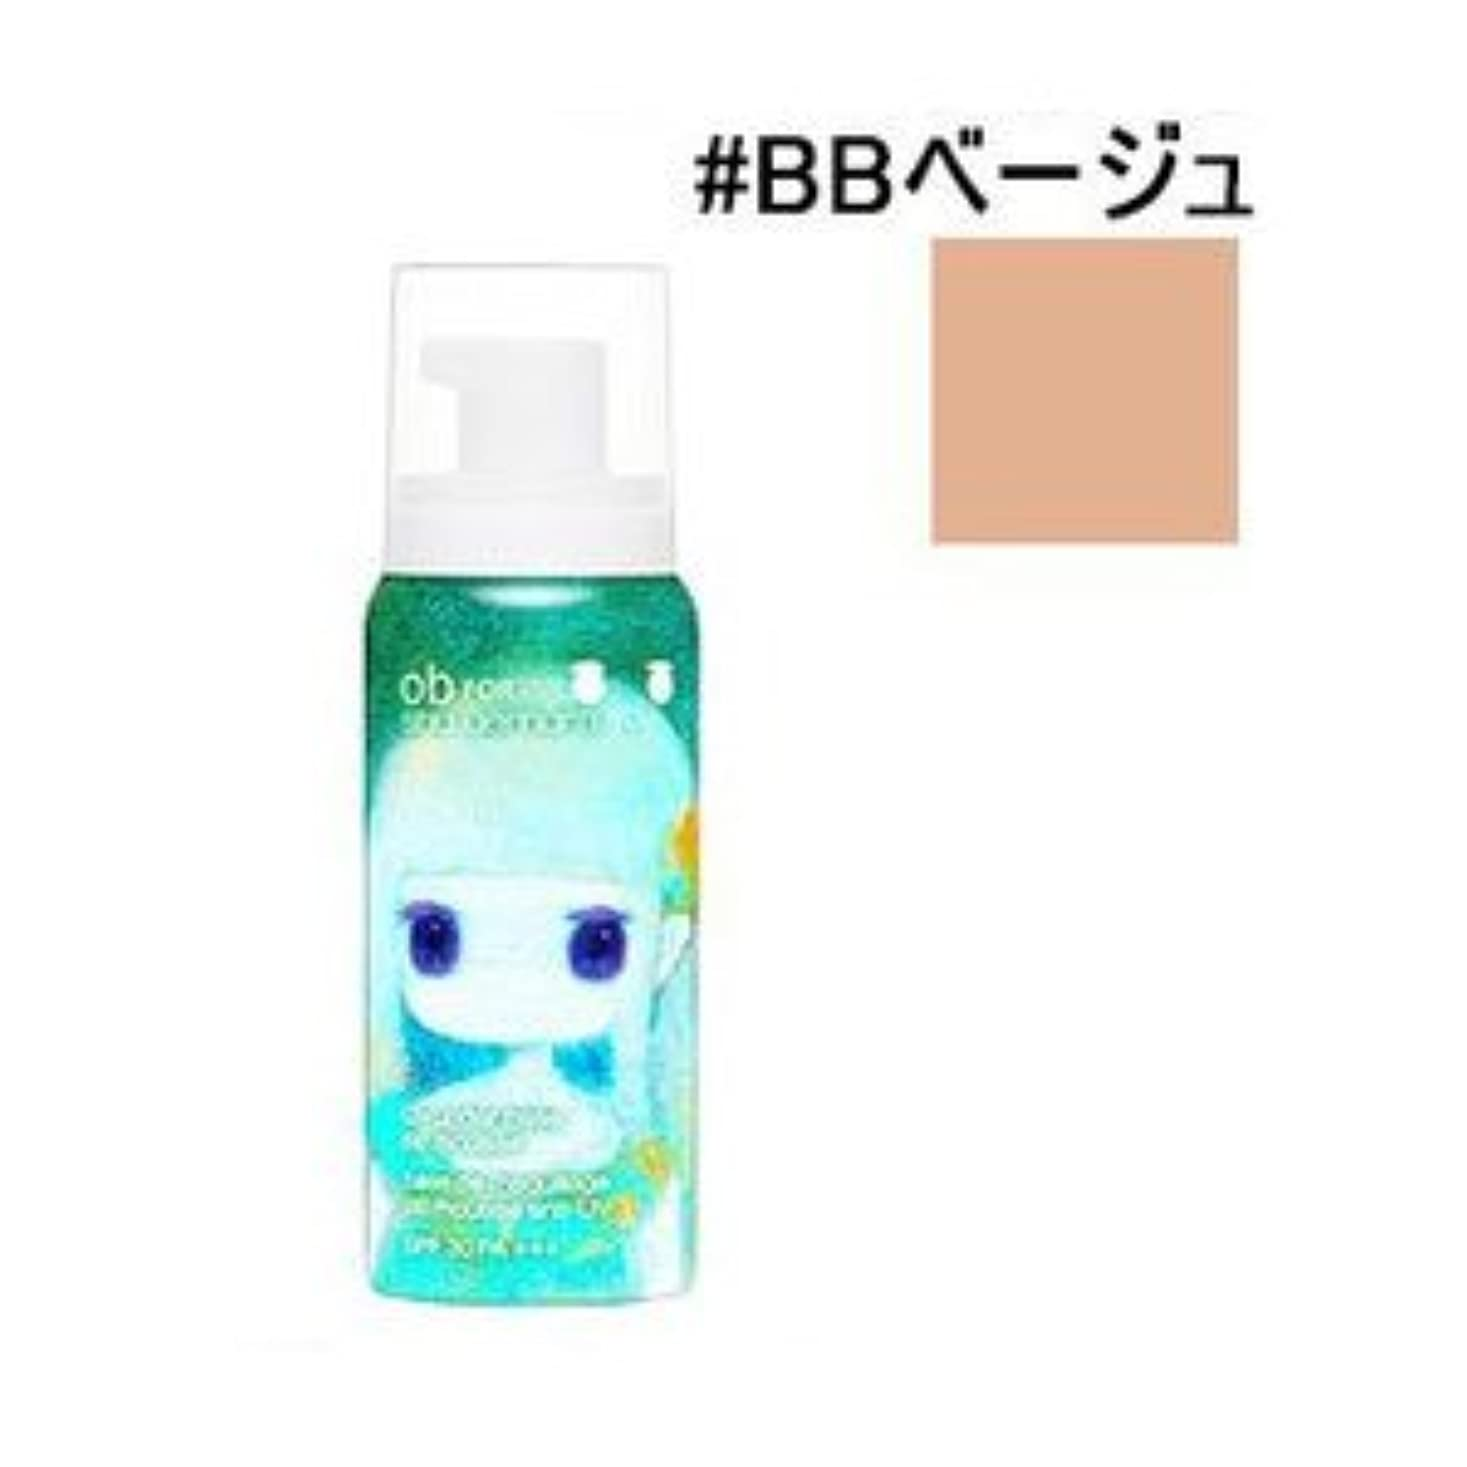 shu uemura シュウ ウエムラ<br>UV アンダー ベース ムース #BB beige<br>SPF 30 ? PA+++<br>65g [並行輸入品]